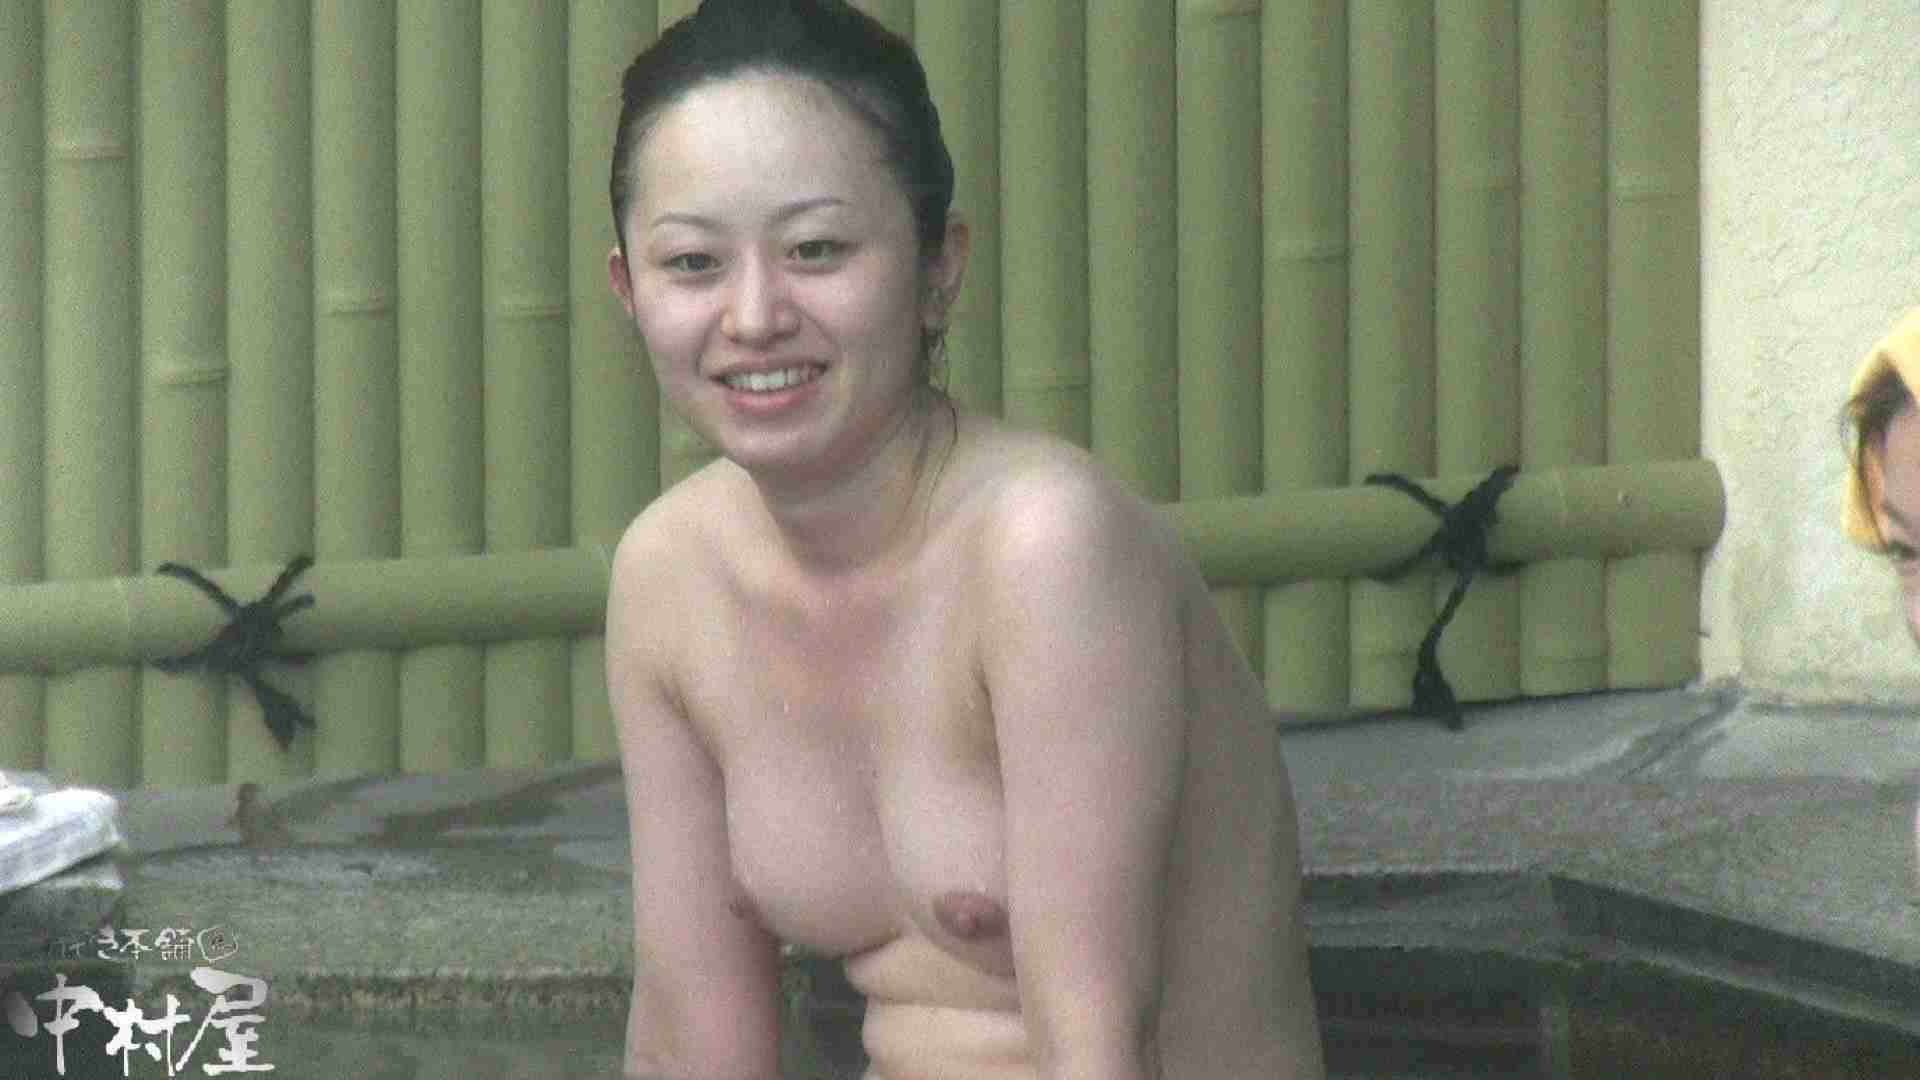 Aquaな露天風呂Vol.912 OLセックス   盗撮  62画像 43